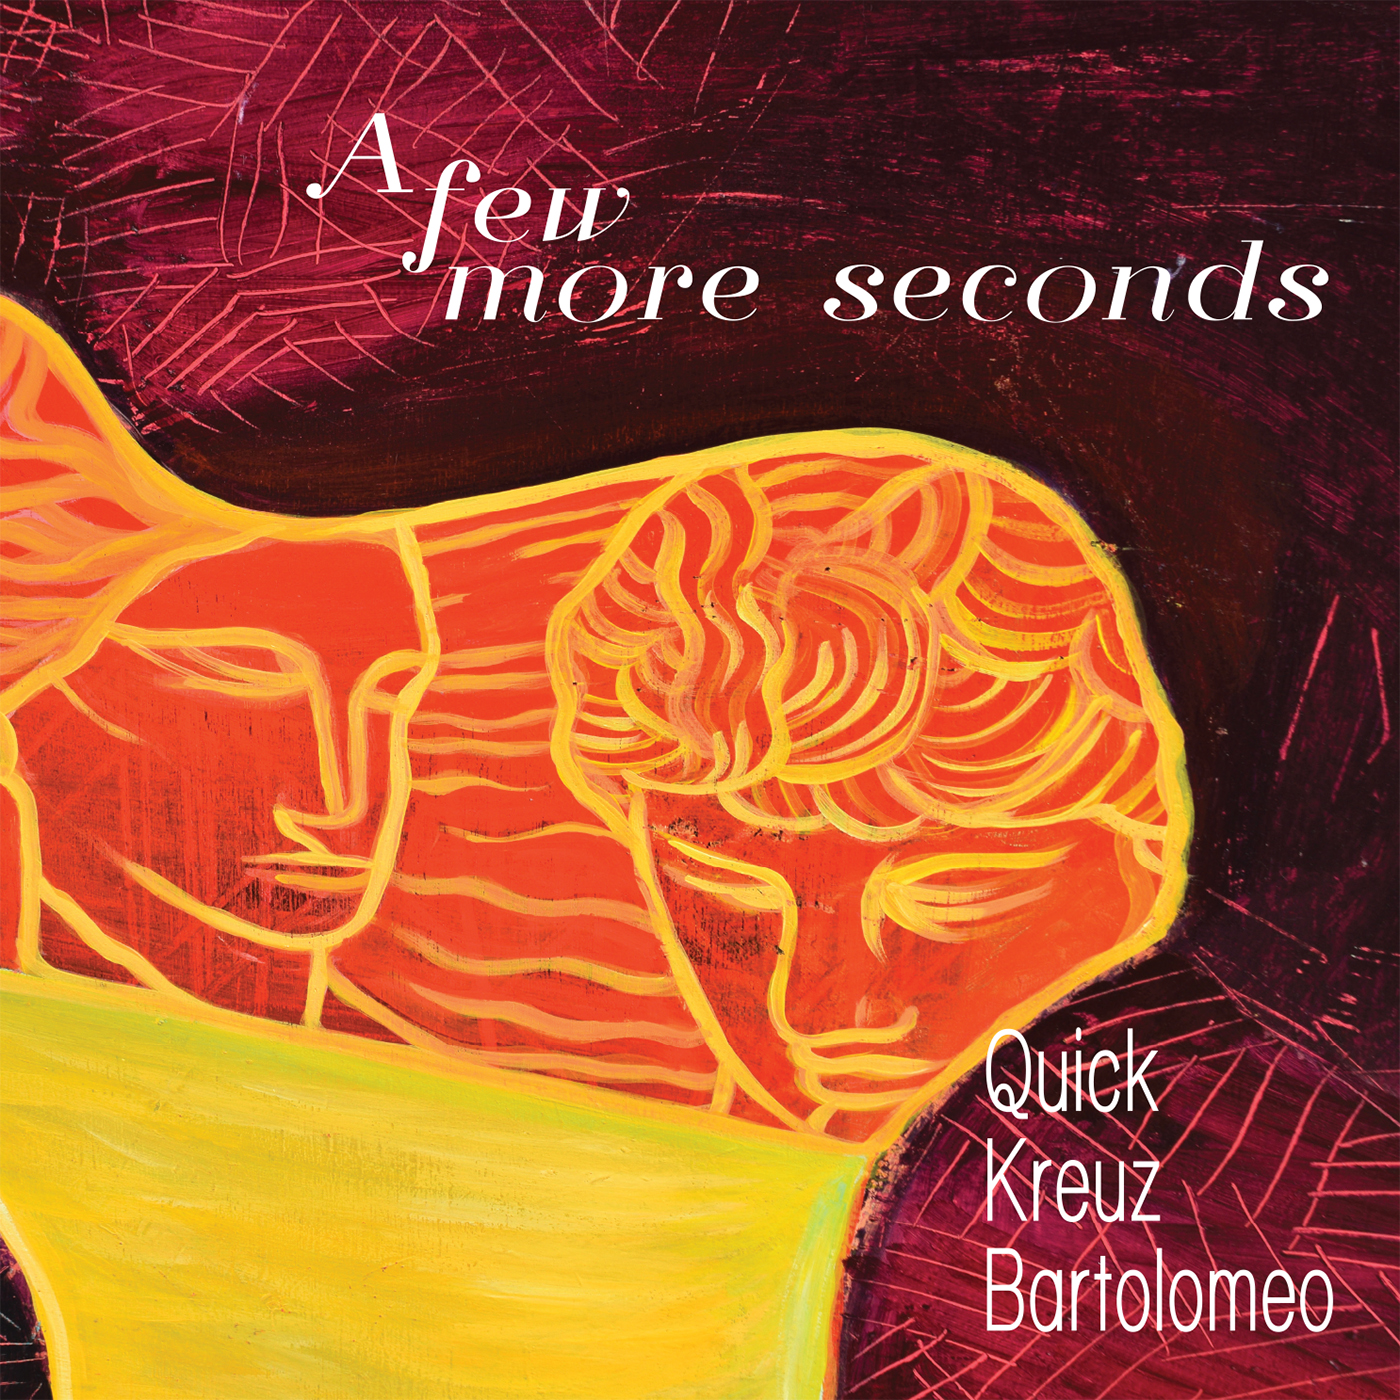 jq_a_few_more_seconds-cover.jpg